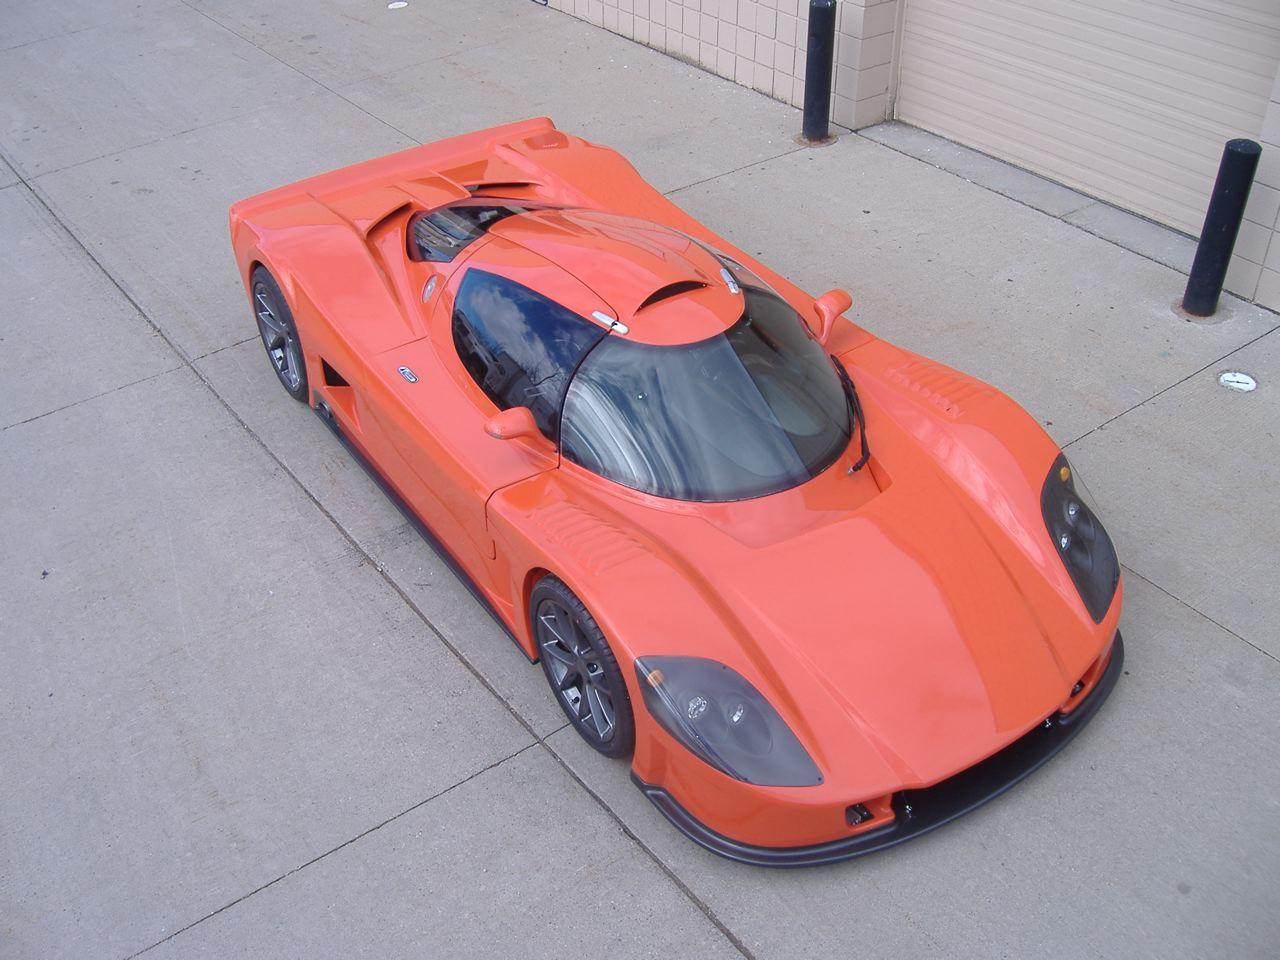 Superlite_SLC_Orange_TopSideFrontCorner2_zps8afb37ab.jpg